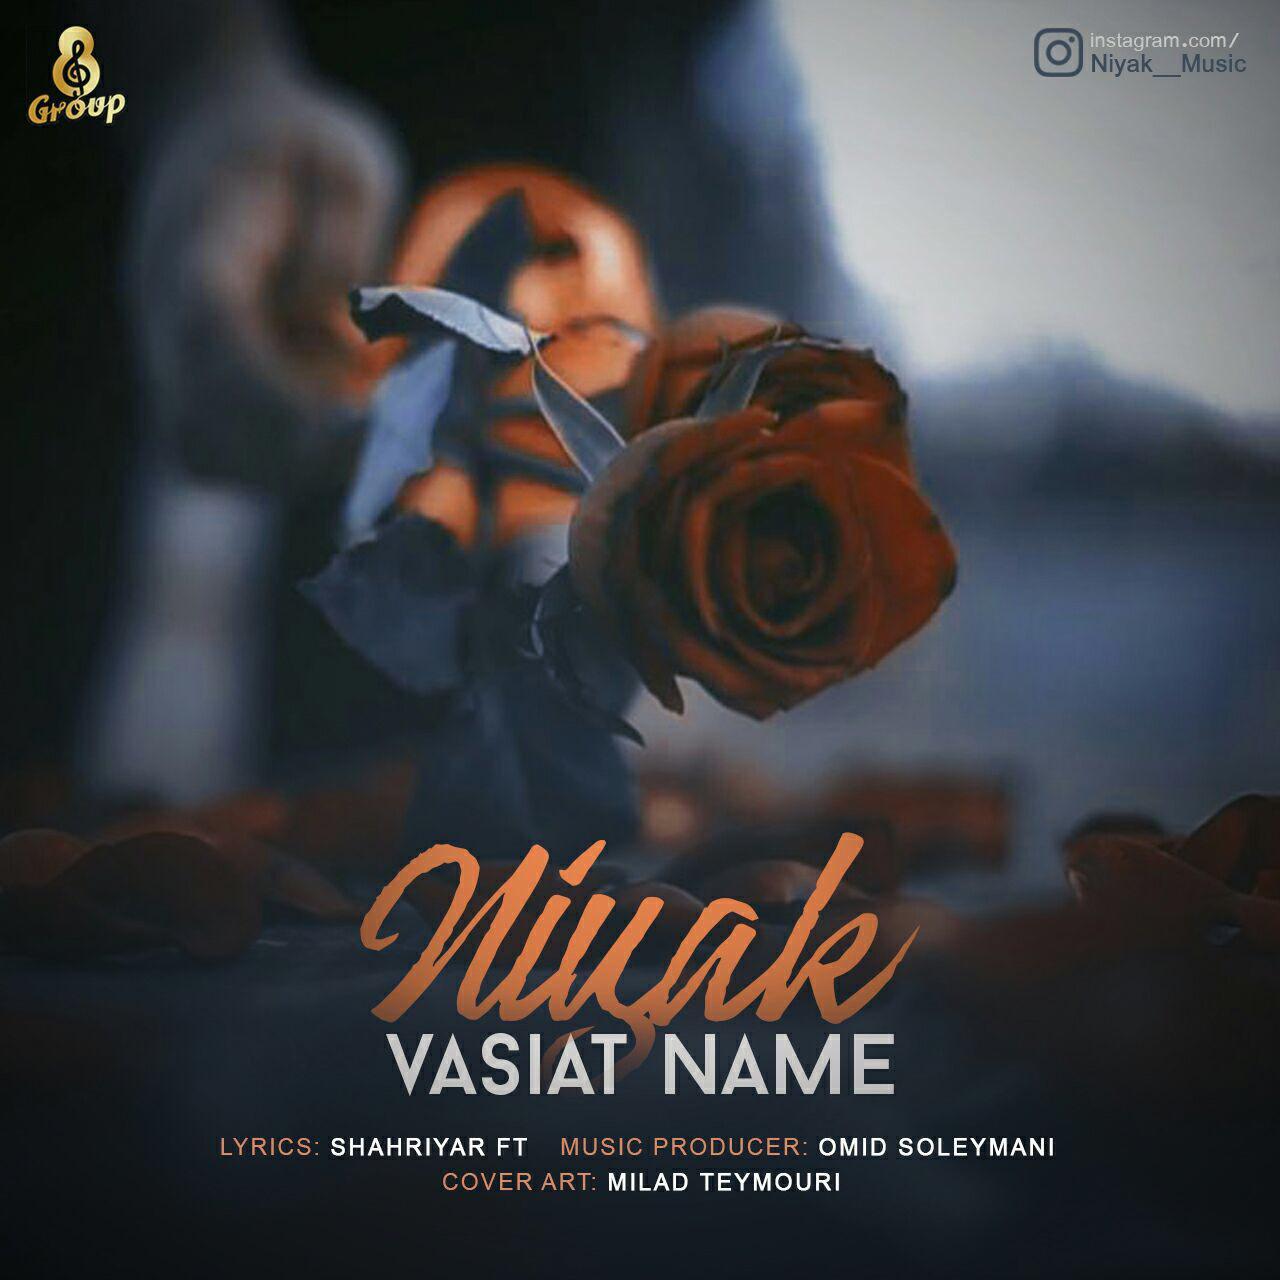 Niyak – Vasiyat Name